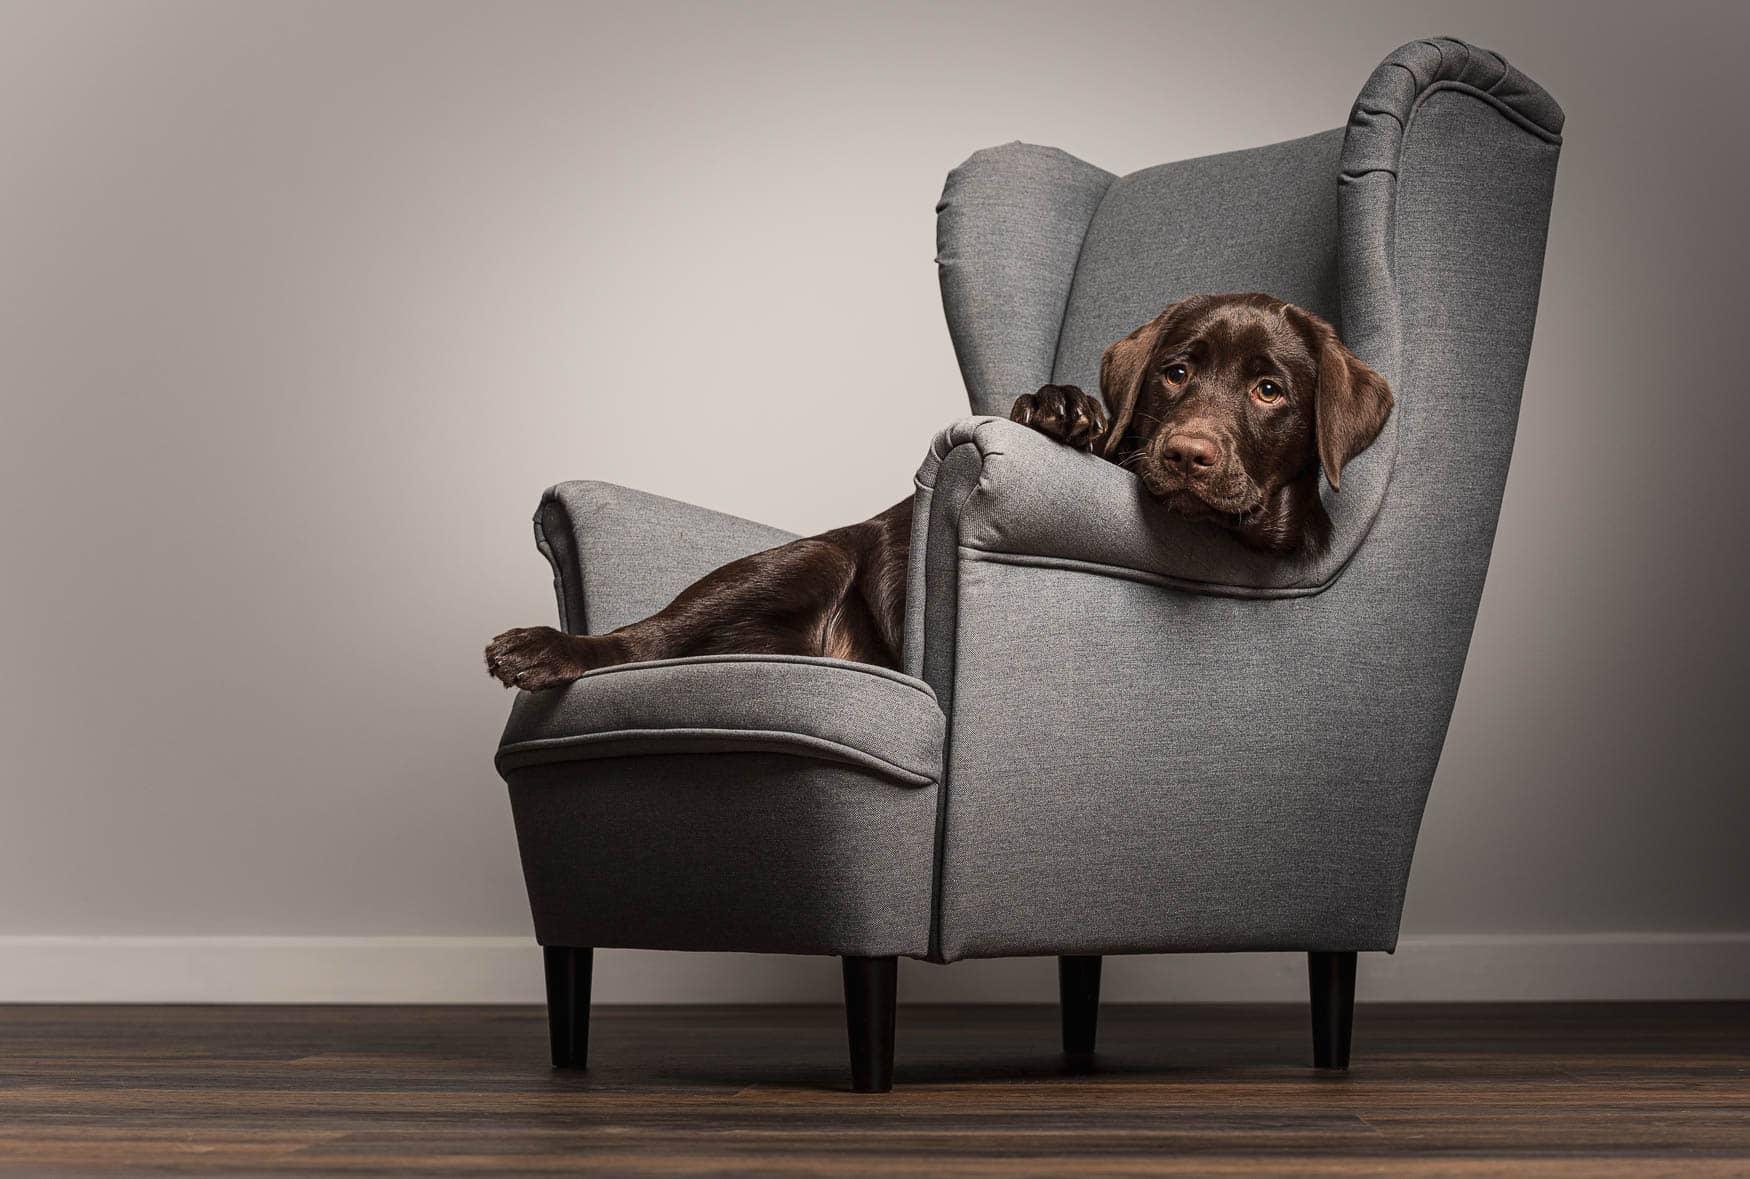 Fine art studio dog photographer Cheshire - Working Chocolate Labrador puppy